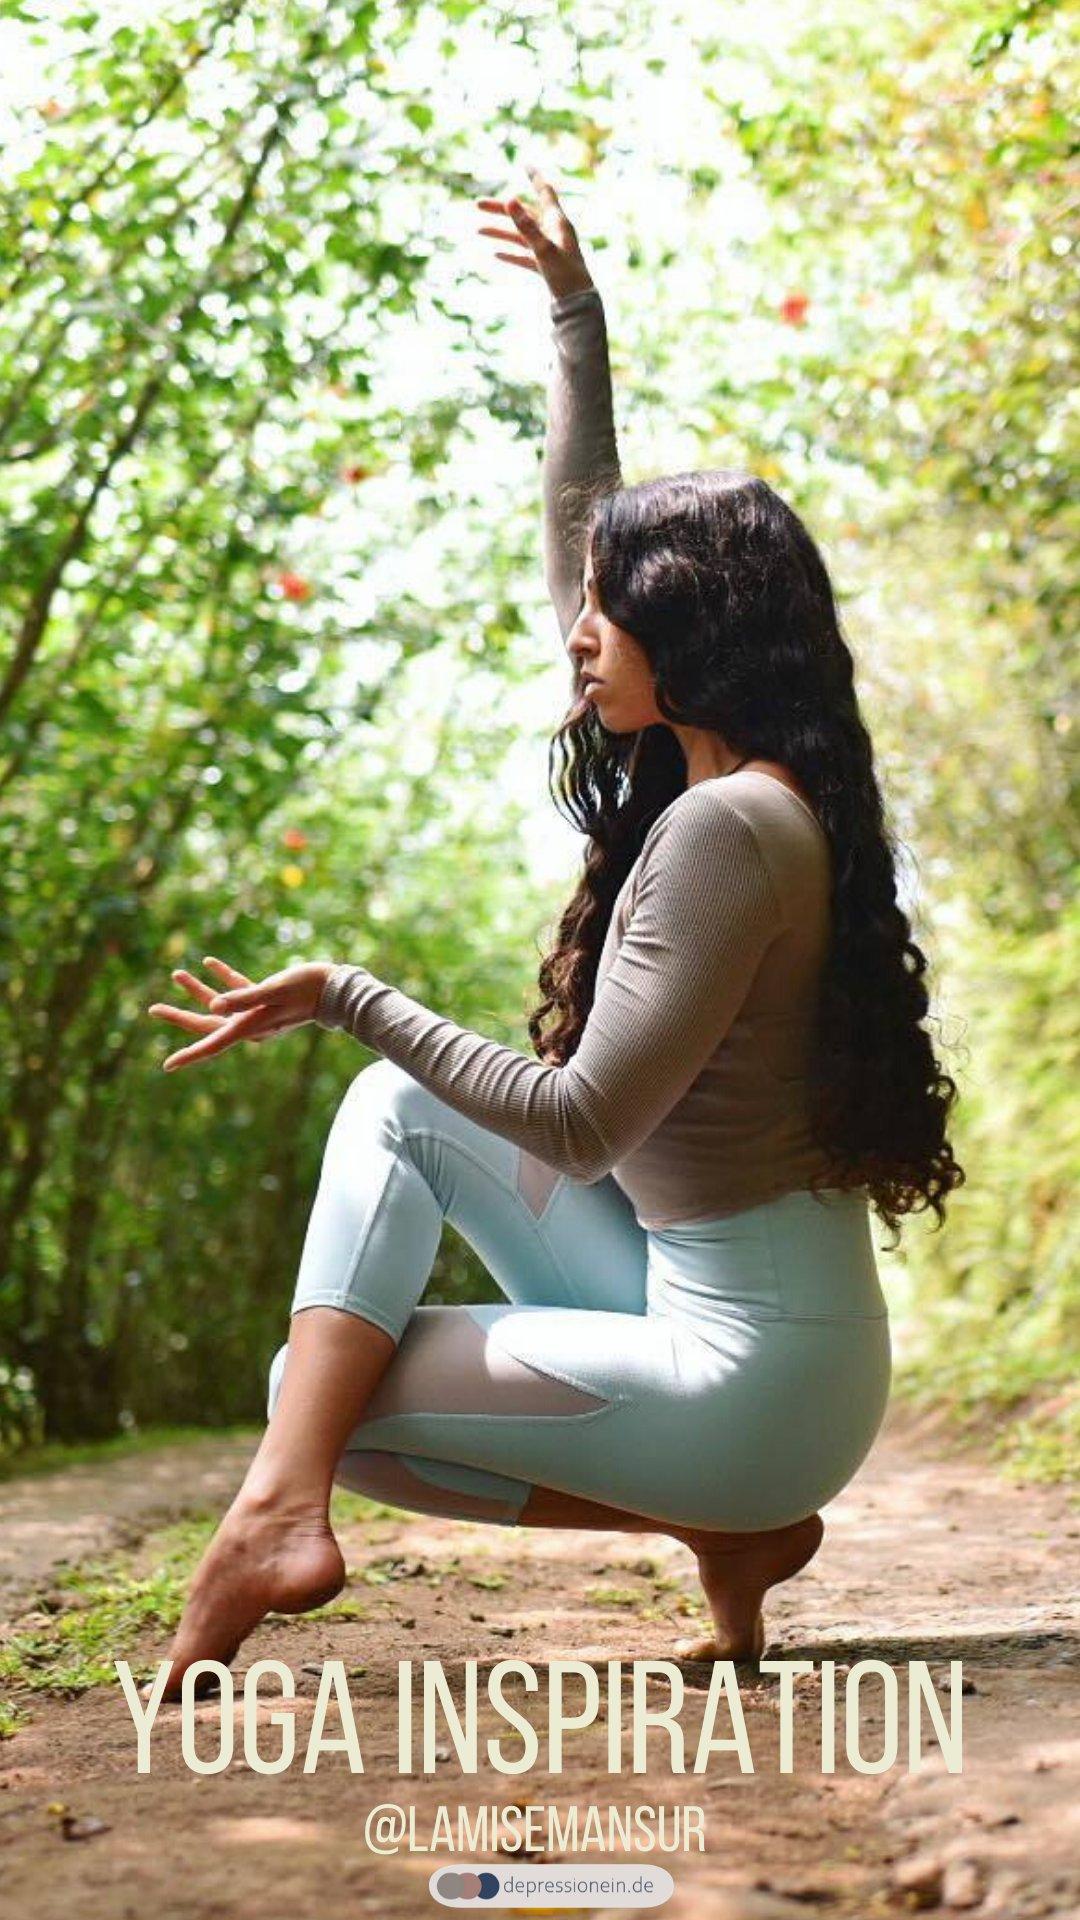 Yoga Inspiration - Lamise Mansur